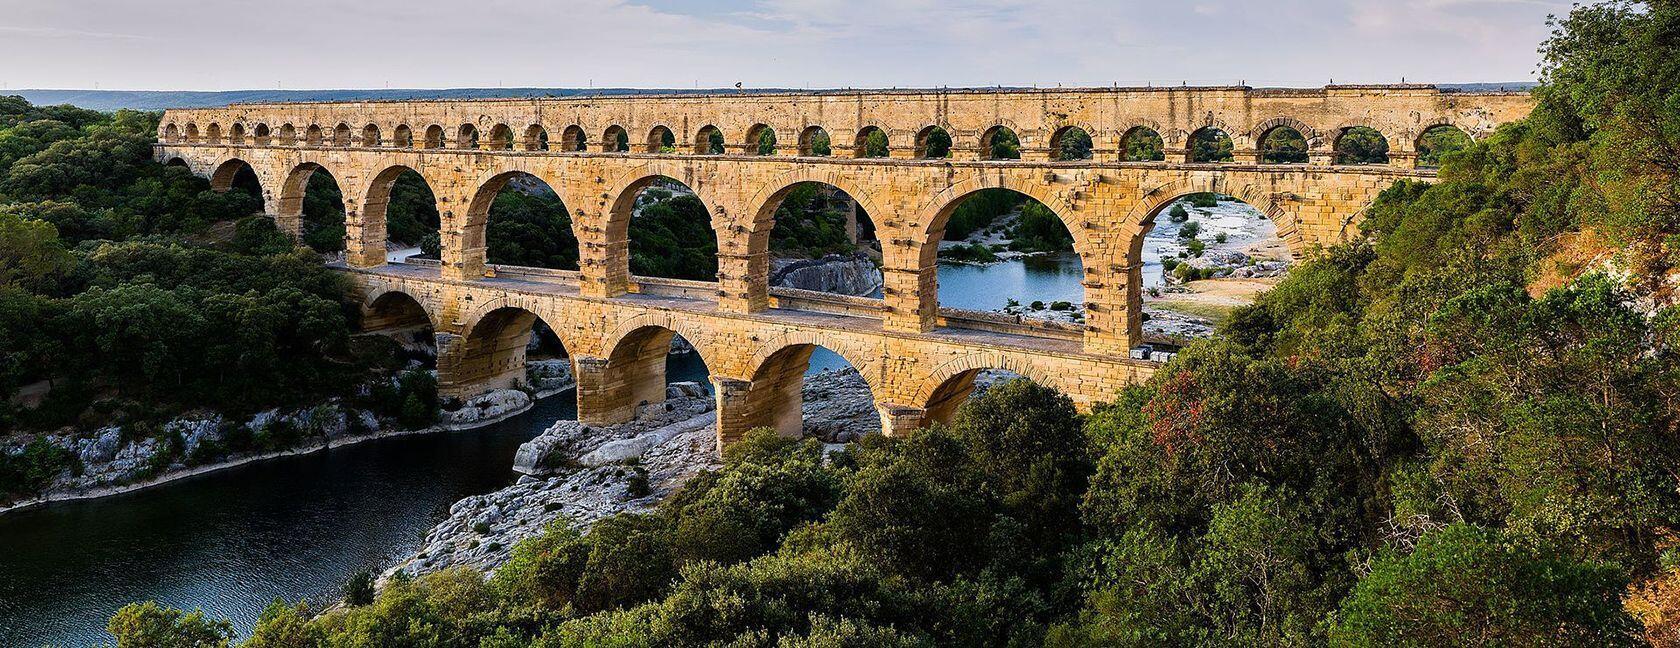 Pont_du_Gard Benh Lieu Song